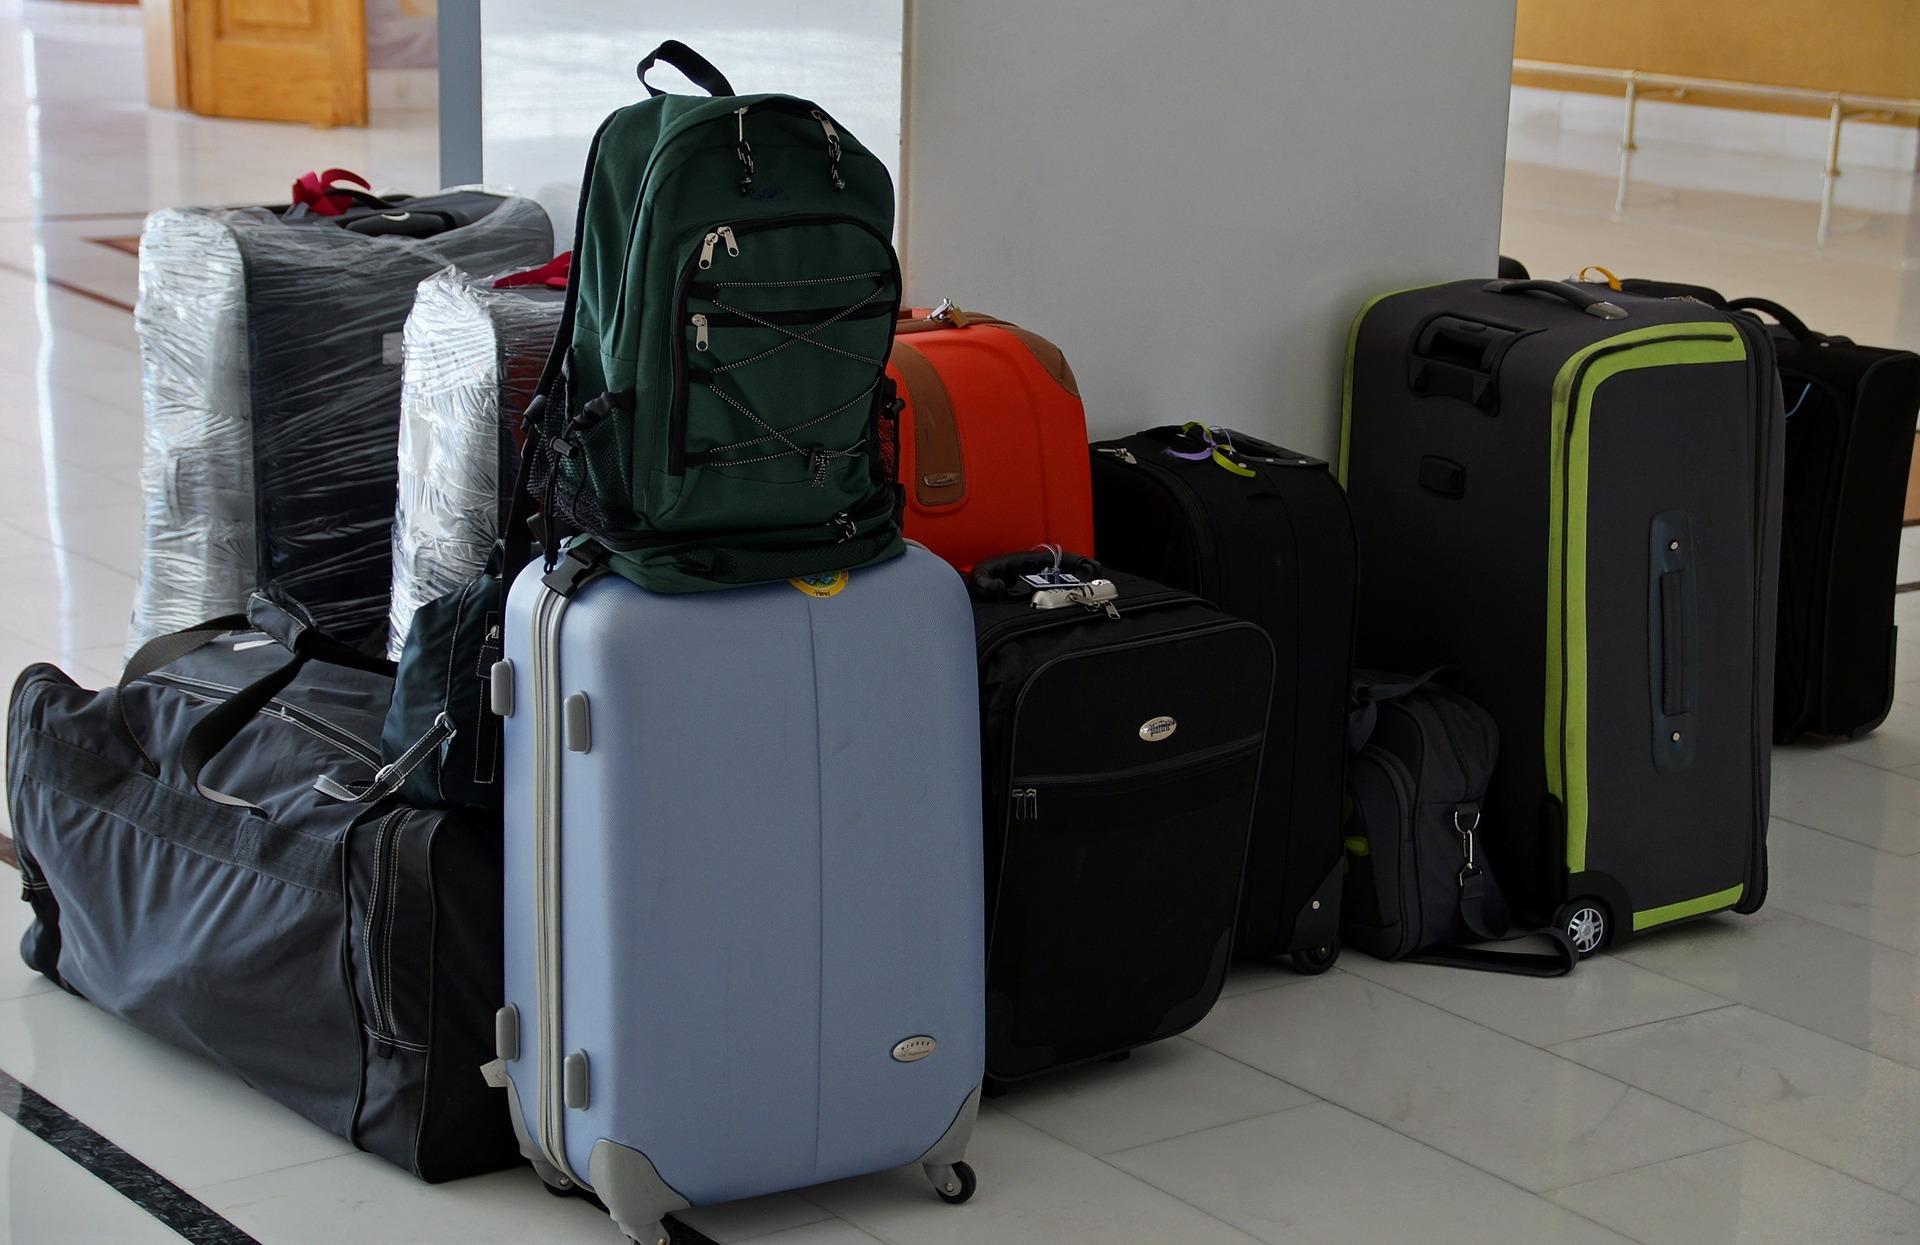 e74d2e375c 国内の旅行、出張に一週間行く人におすすめのキャリーバッグ2選